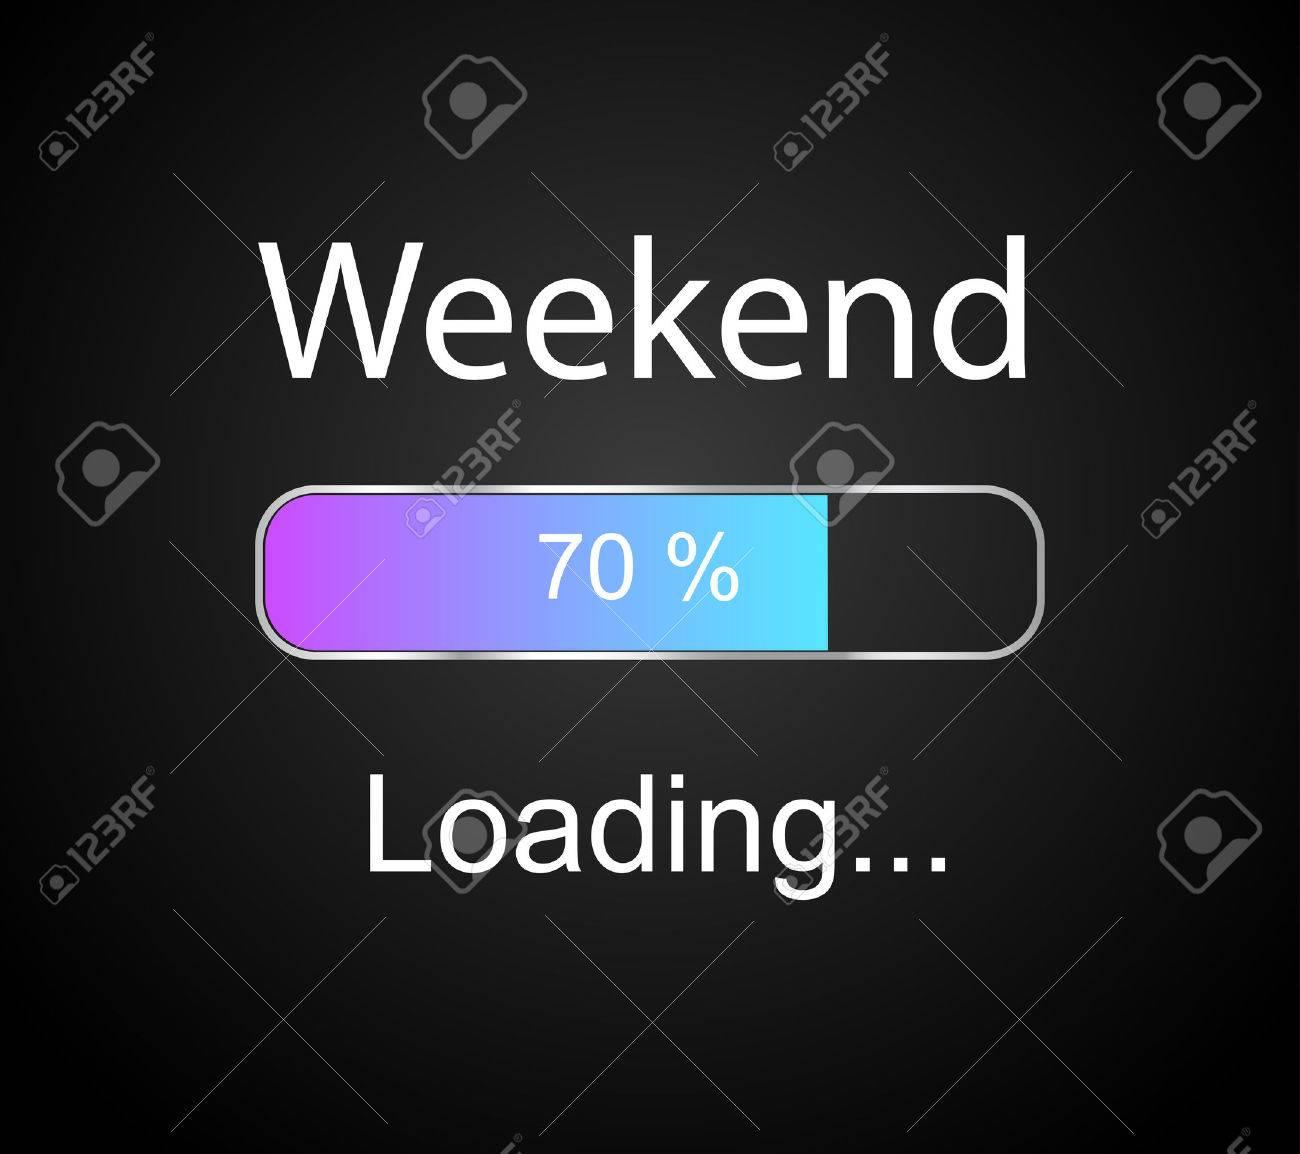 inscription loading Weekend concept illustration background - 31104703